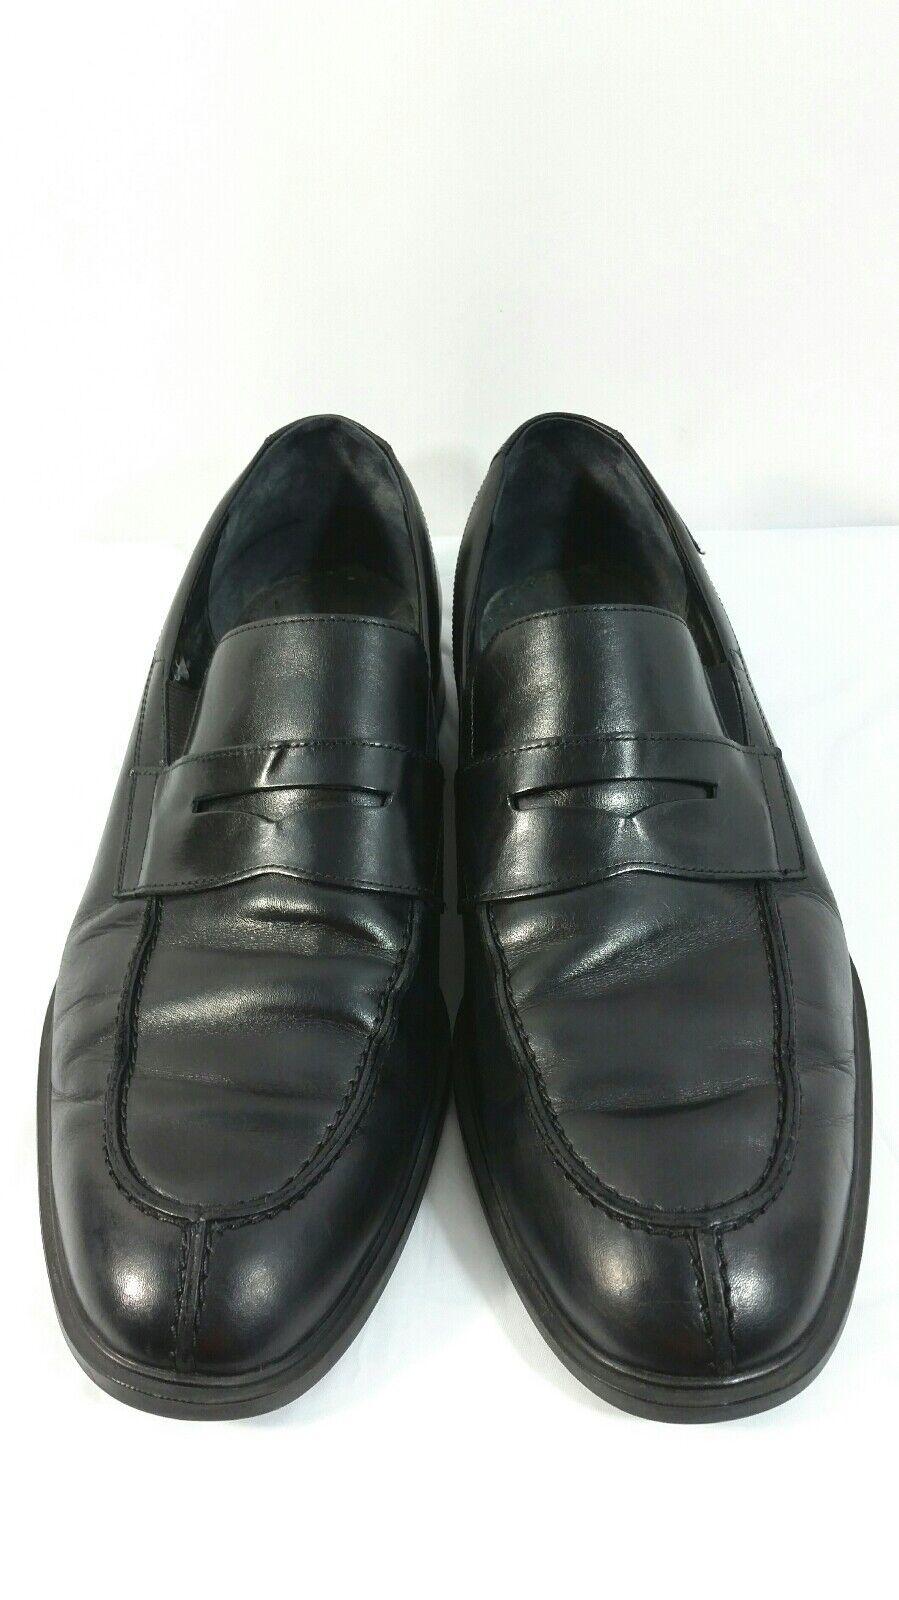 Mephisto Mens Air Jet Black Leather Split Toe Penny Loafer shoes Size 11